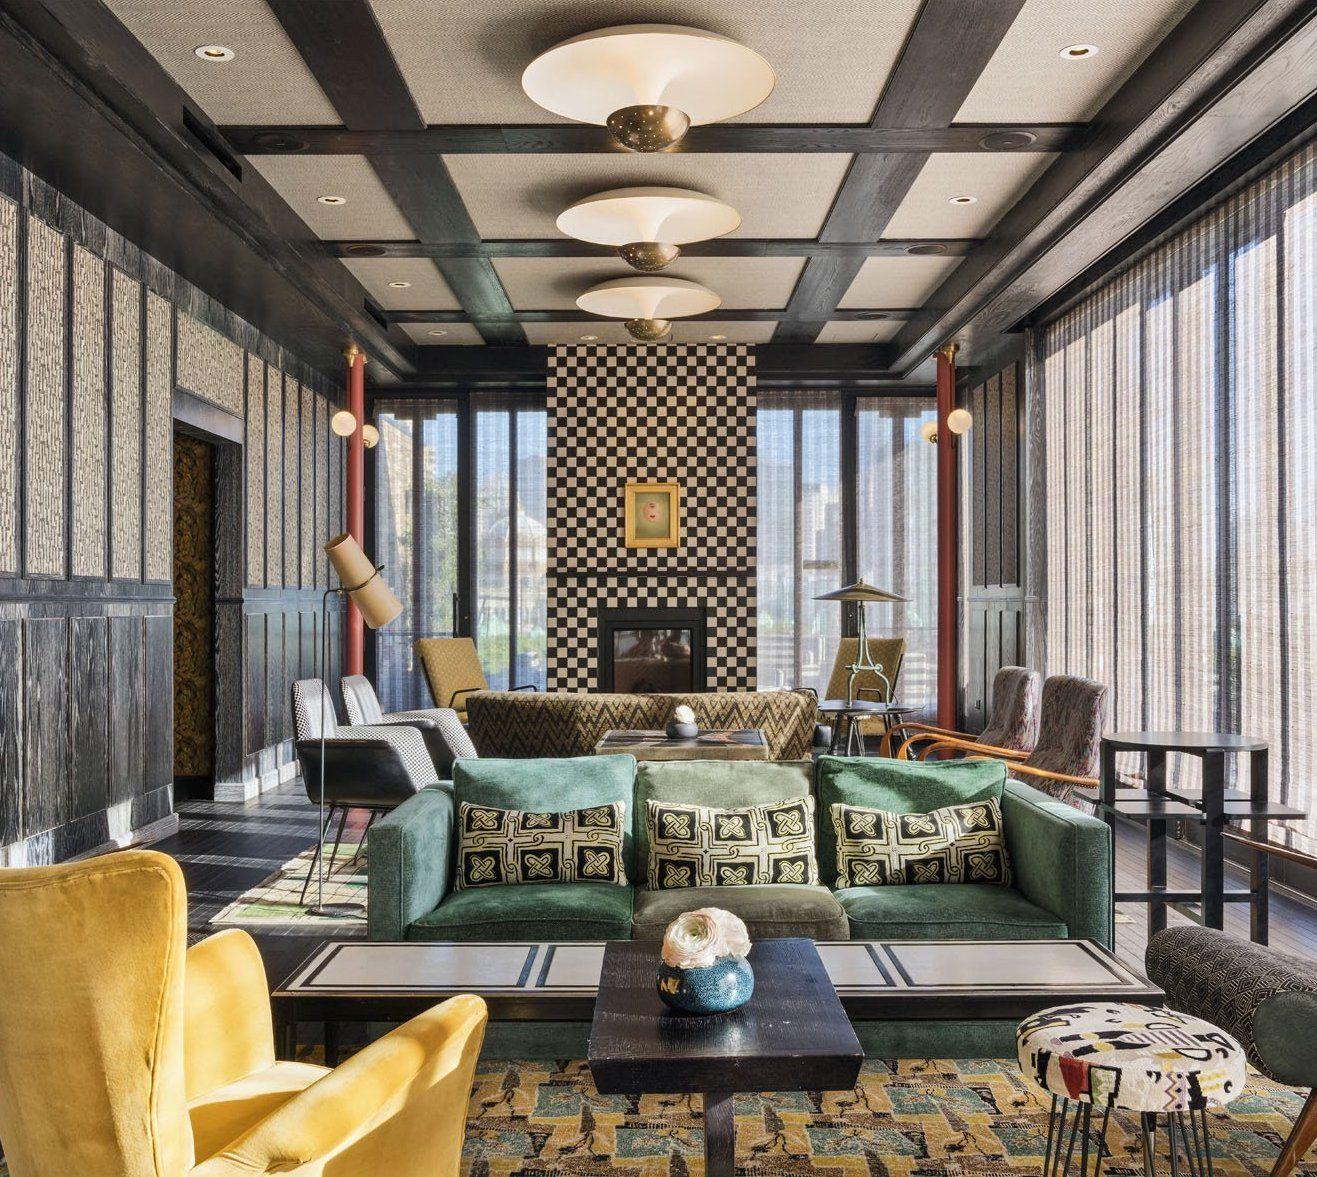 Kelly Wearstler Bar Design Charmaine S At San Francisco Proper Hotel In 2020 Kelly Wearstler Interiors Interior Design Trends Los Angeles Interior Design